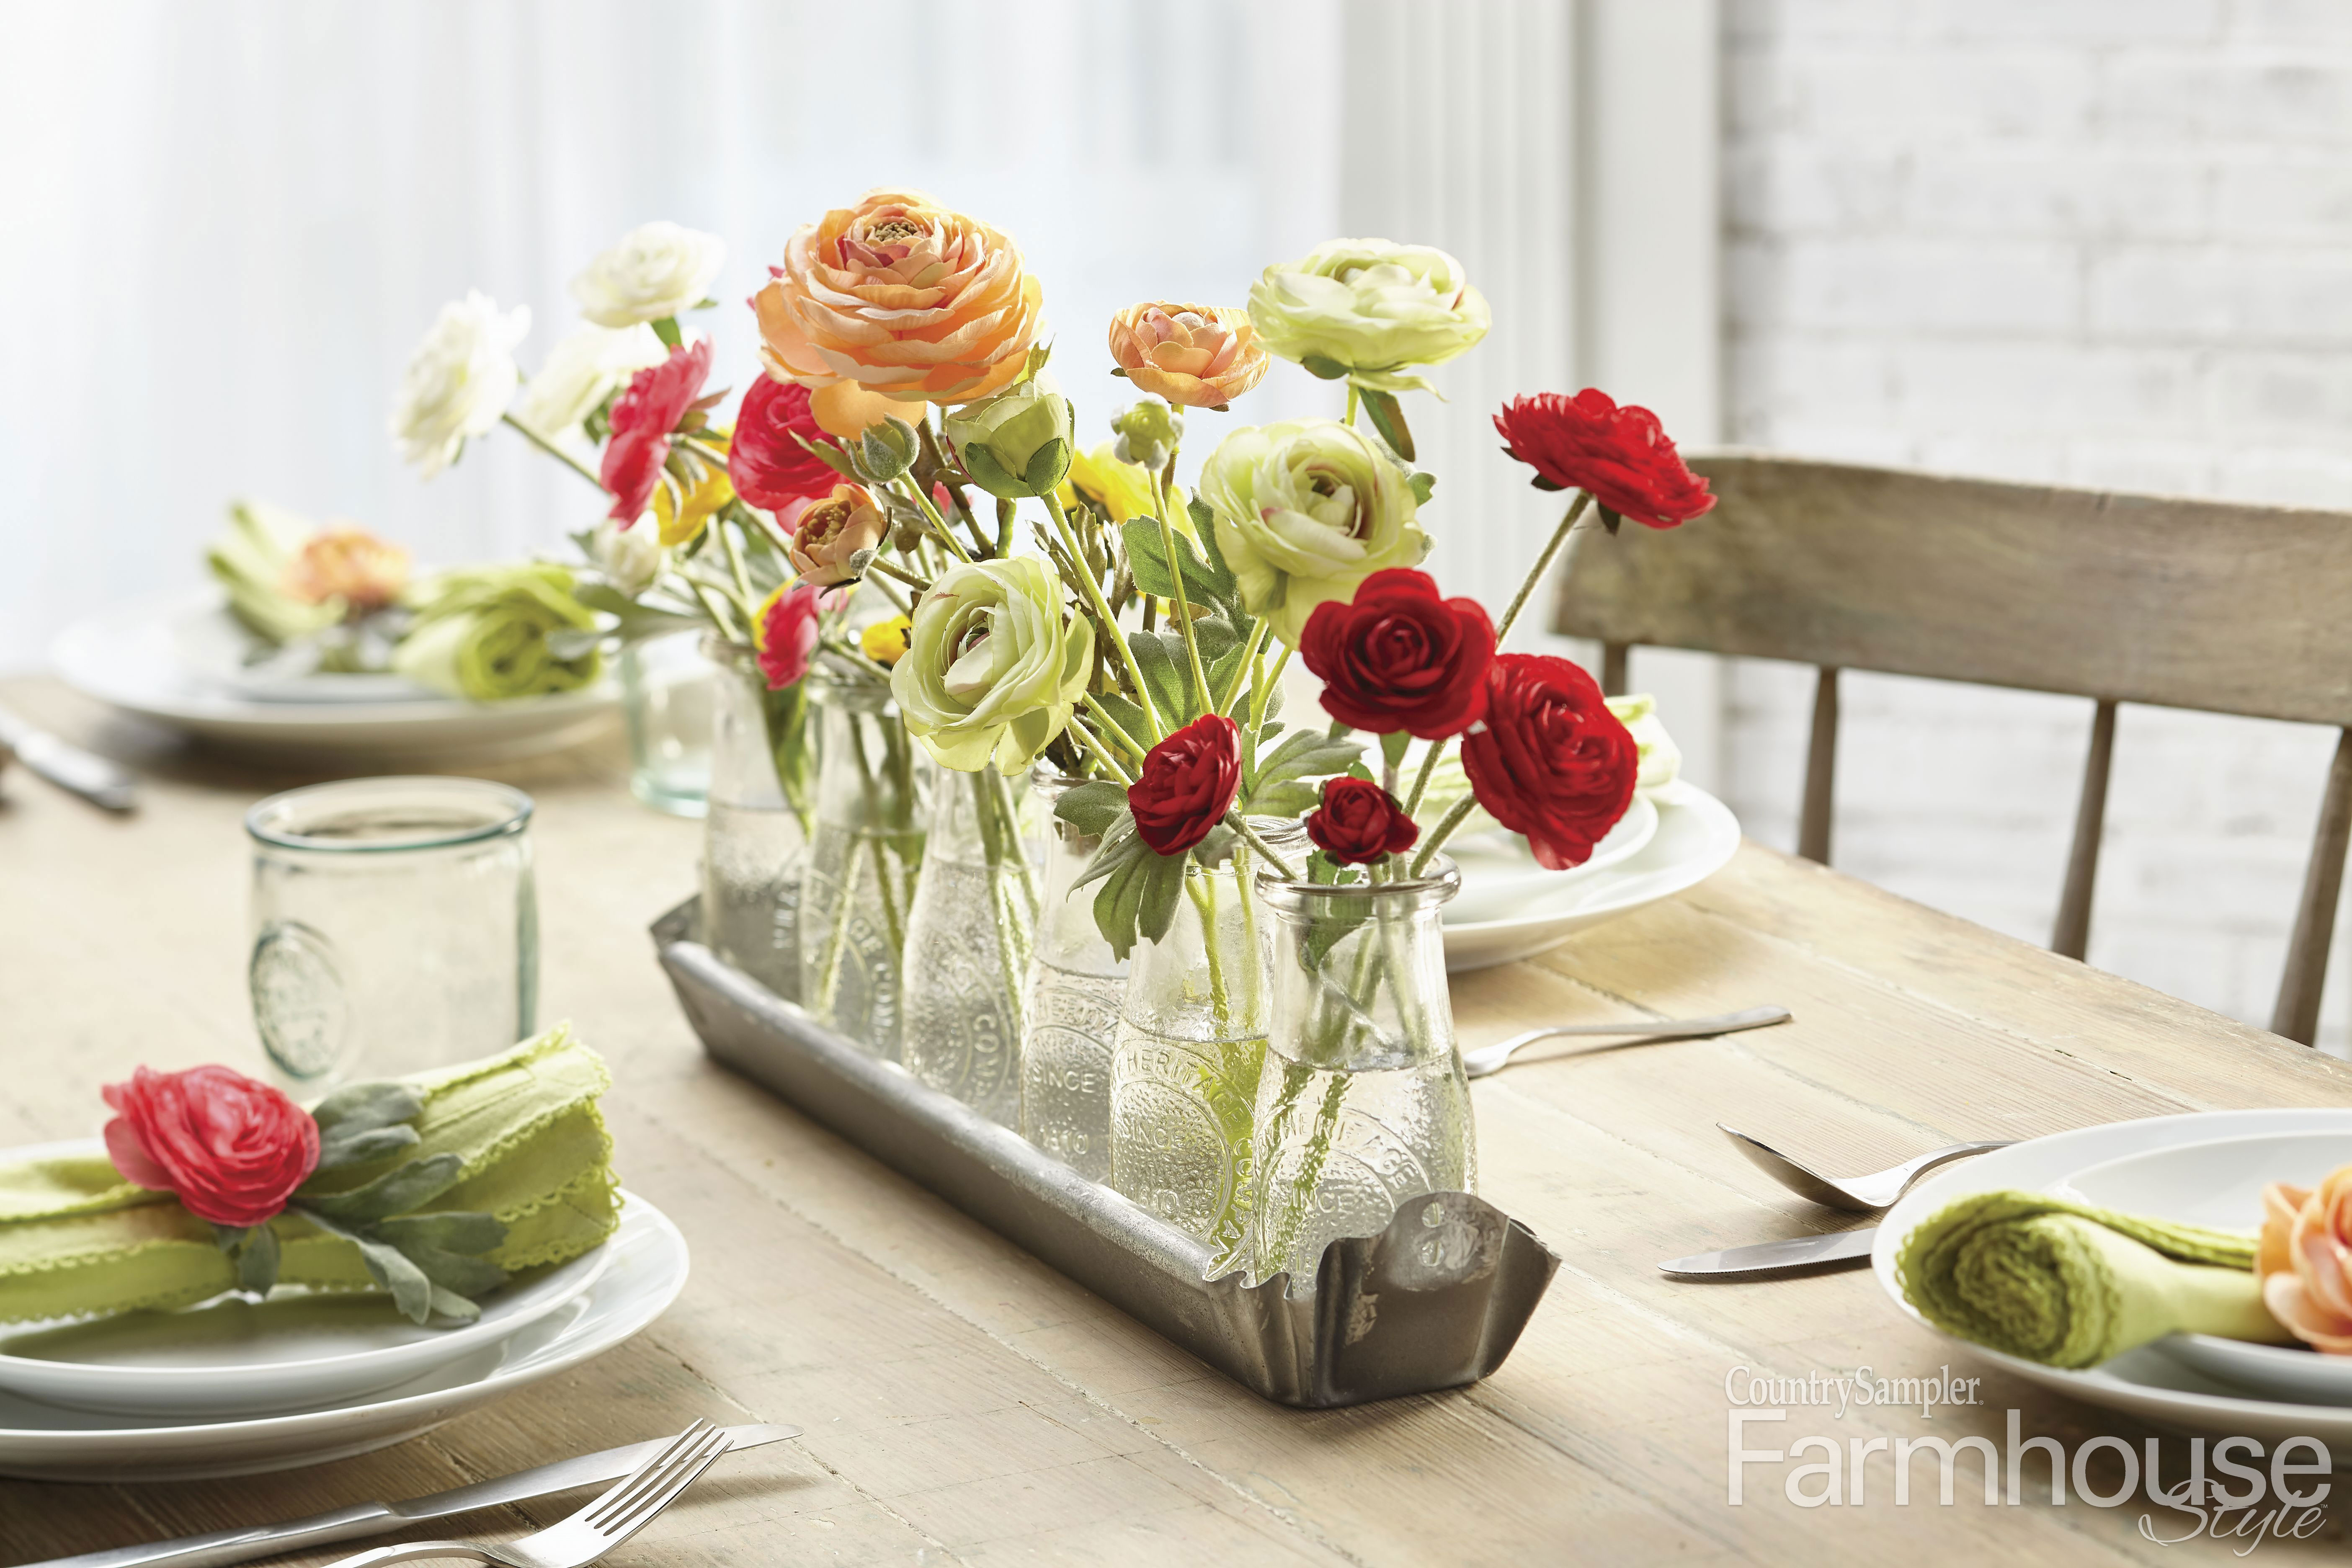 Farmhouse Floral Arrangements How Creative Can You Get